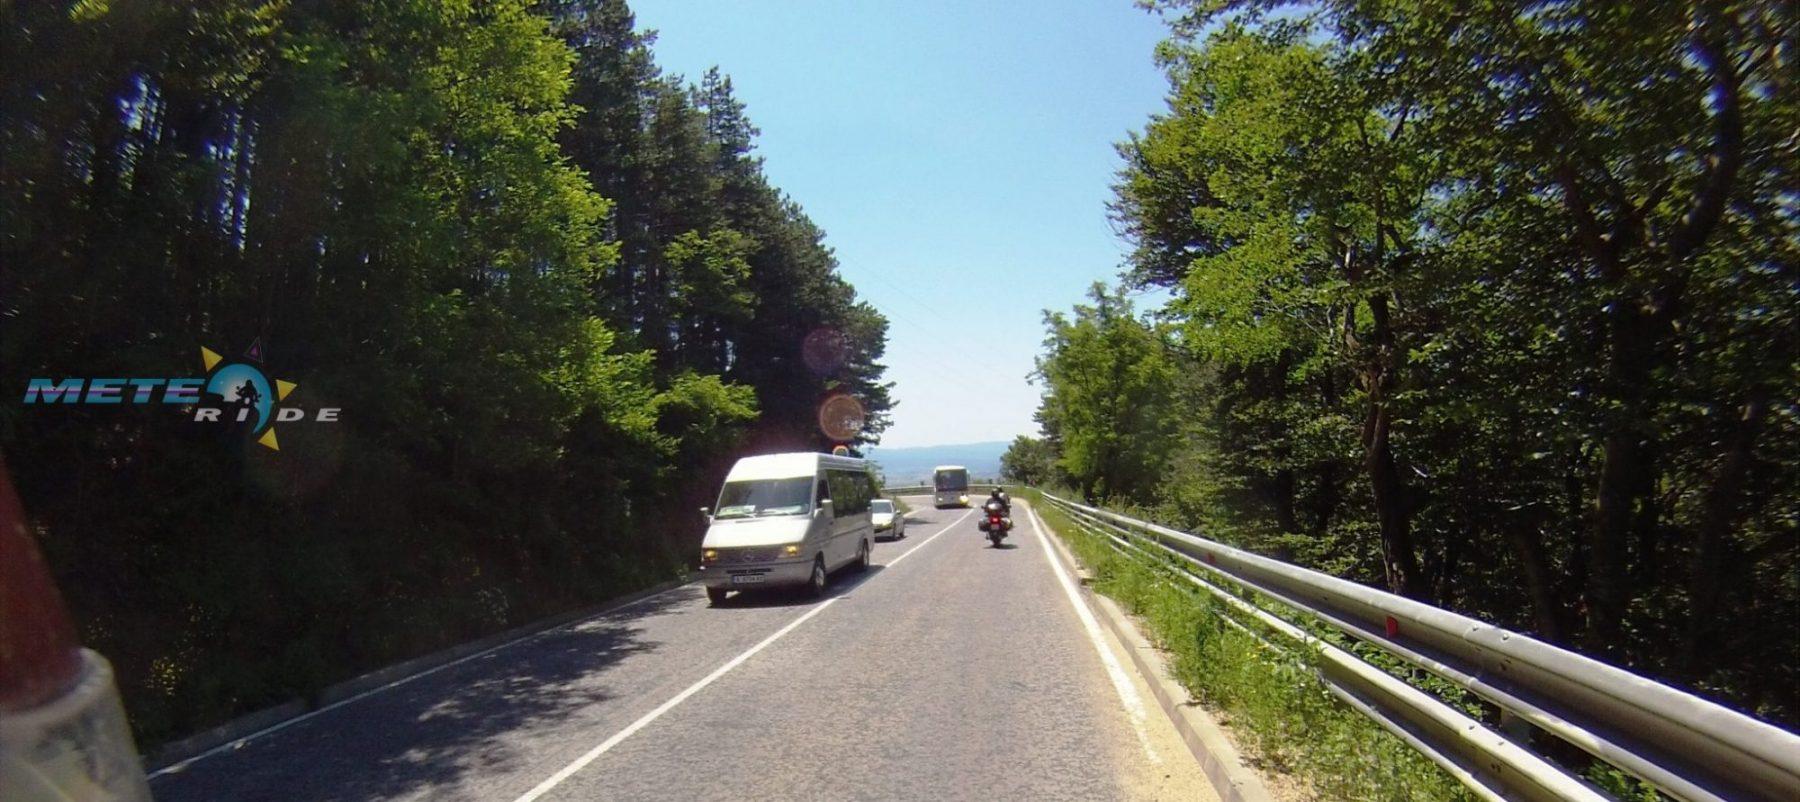 Meteo-Ride Route 5.pph